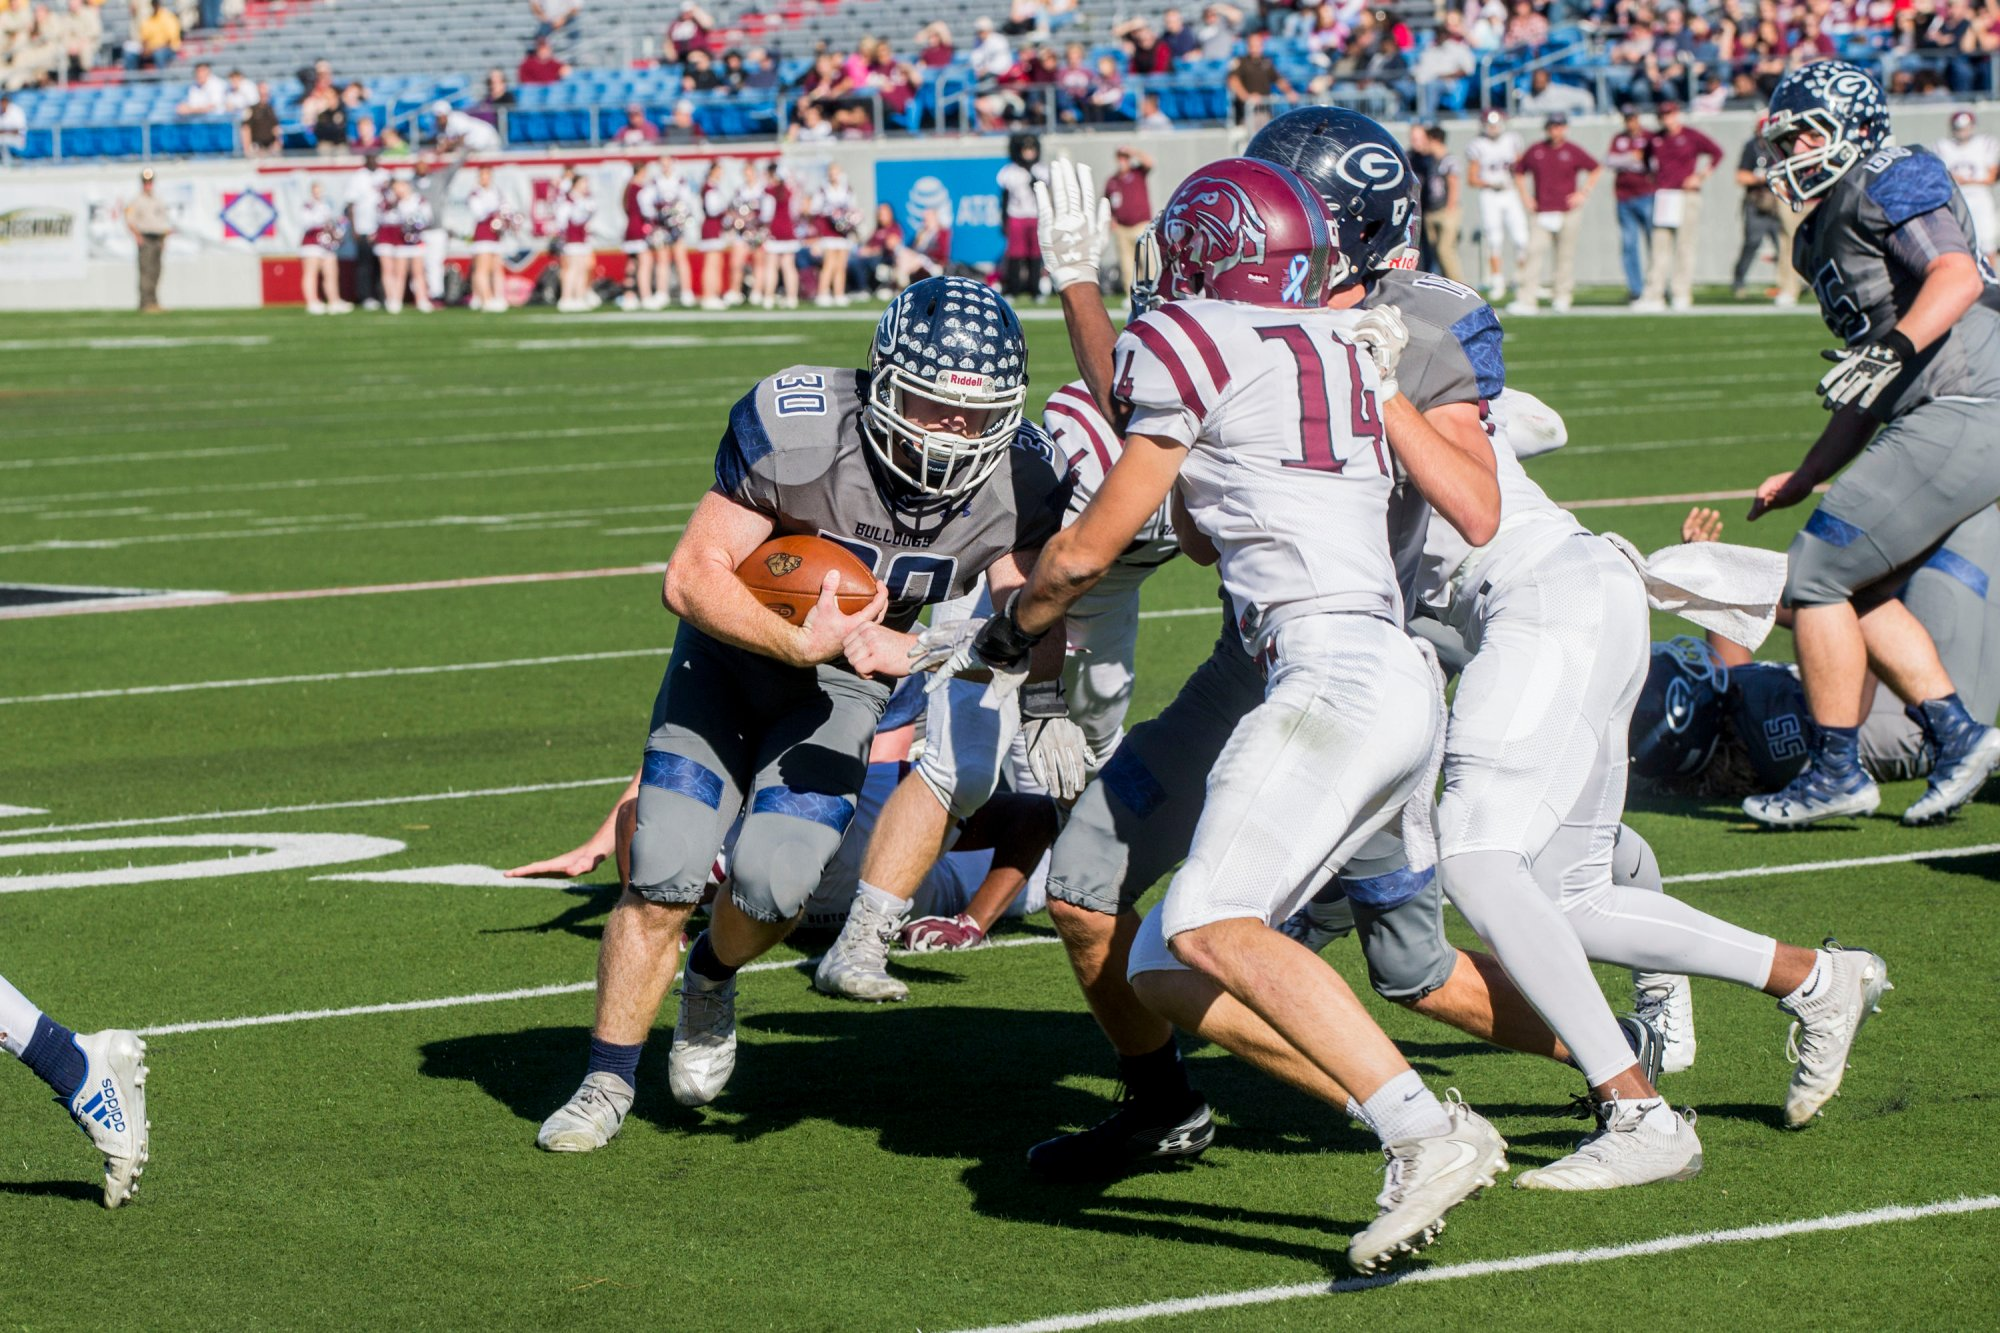 Greenwood v Benton 1st half photos